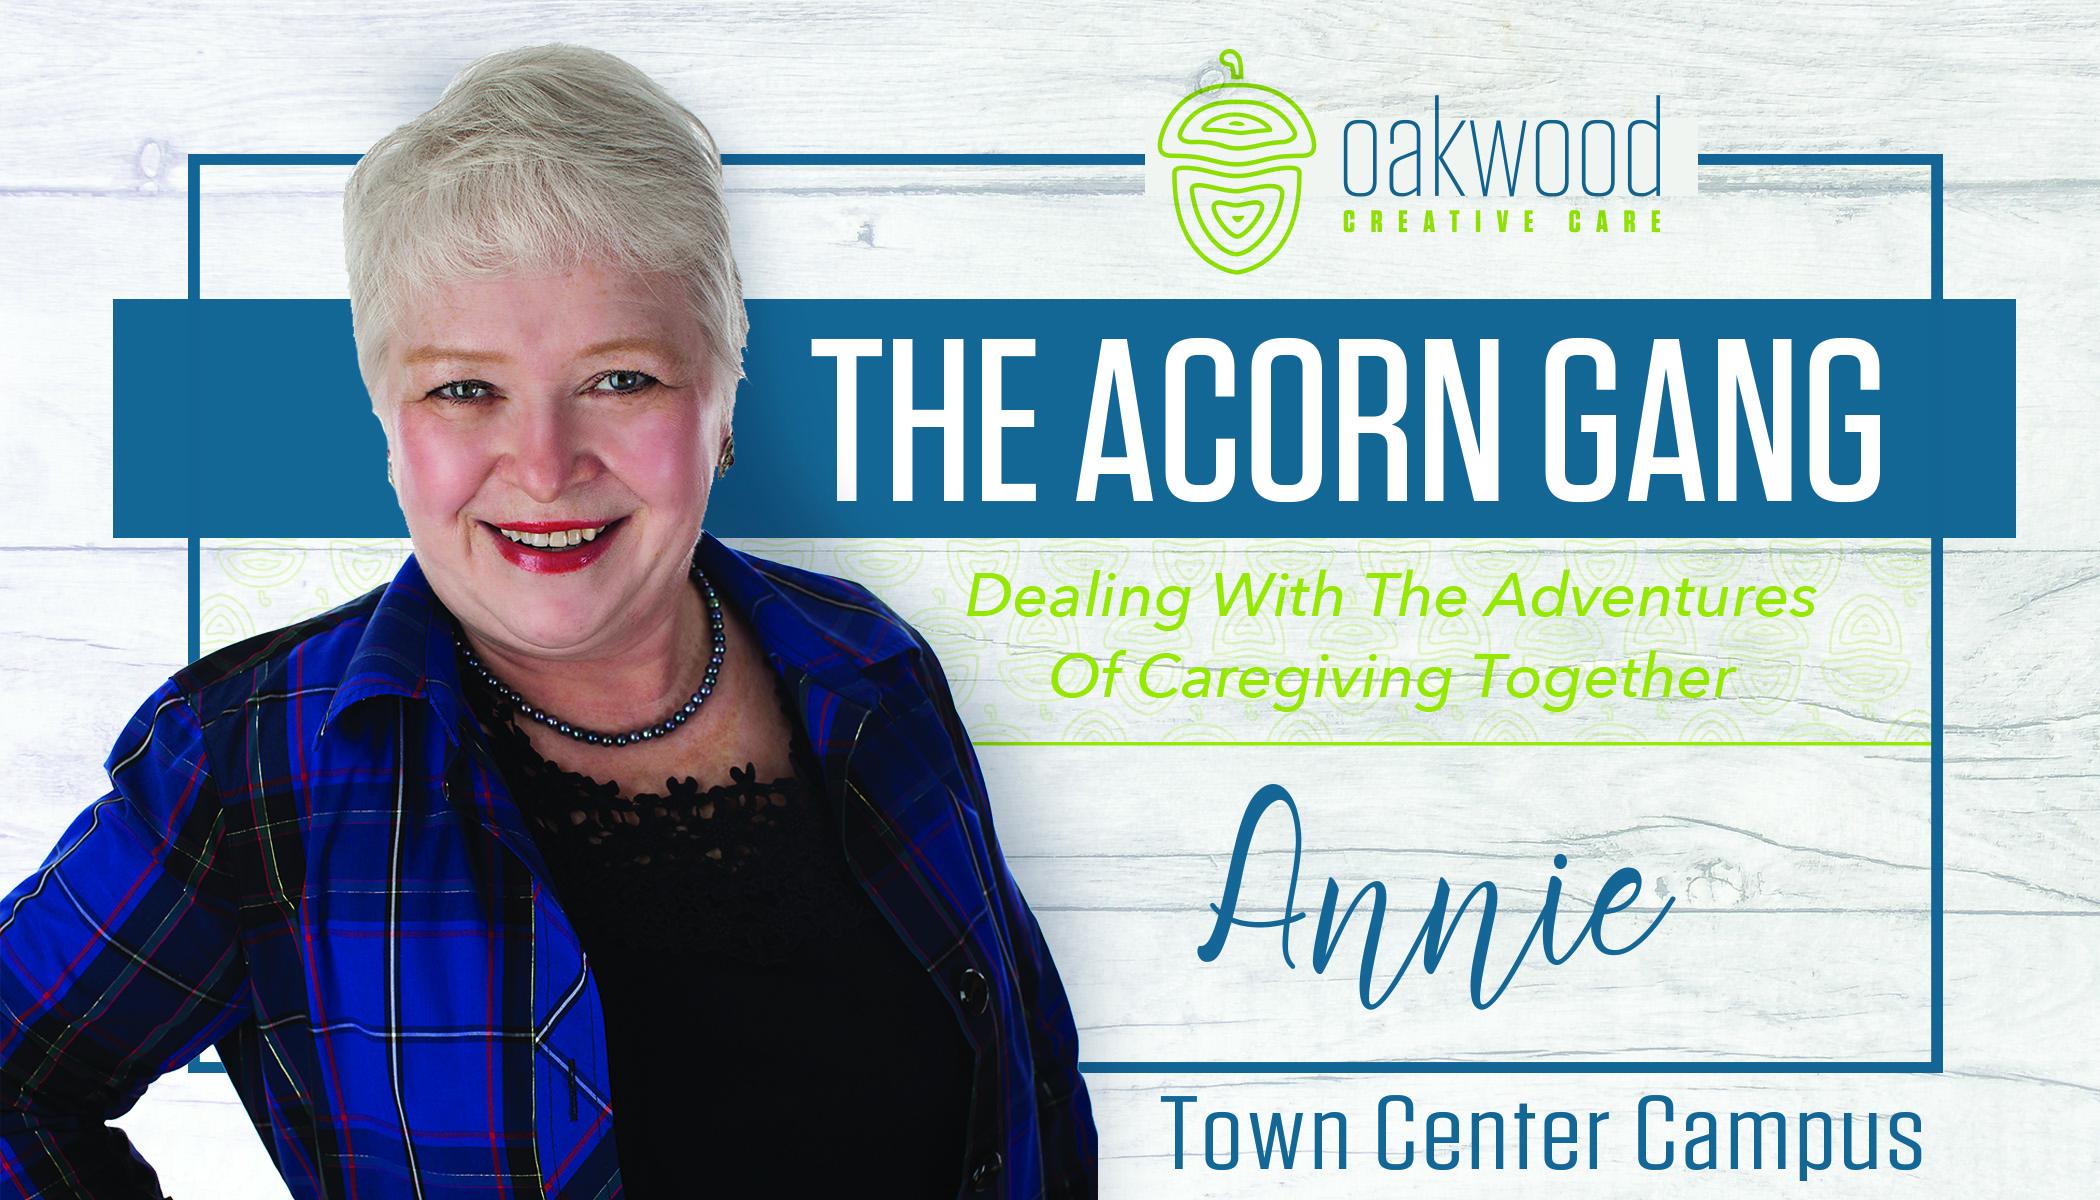 Oakwood_AcornGang_TC - Annie.jpg